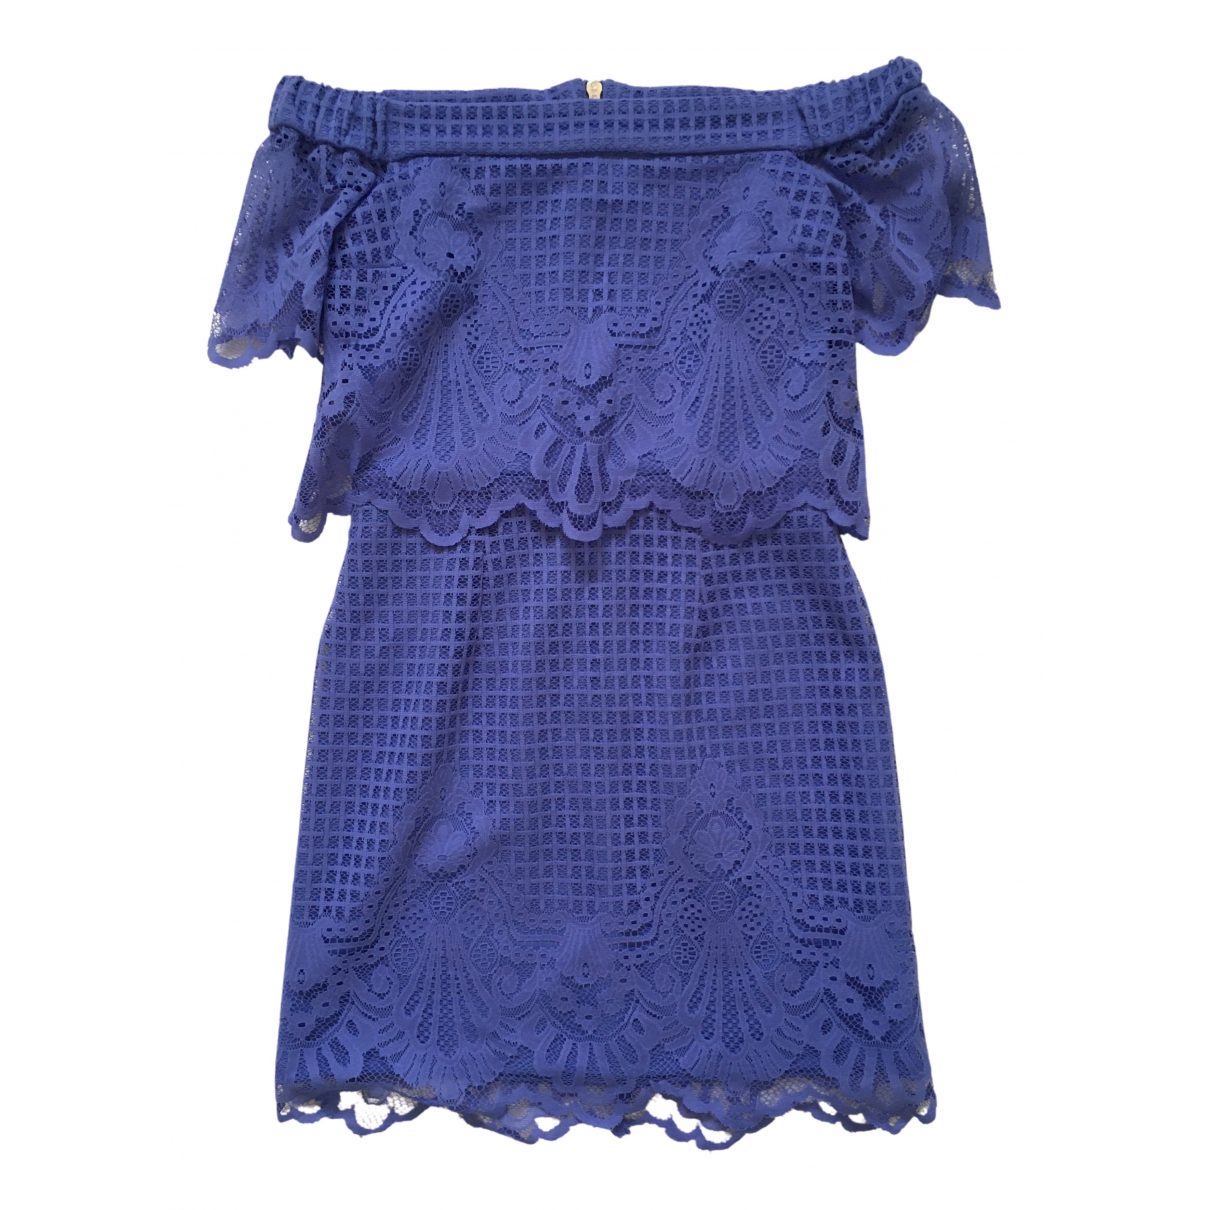 Tophop \N Kleid in  Lila Polyester